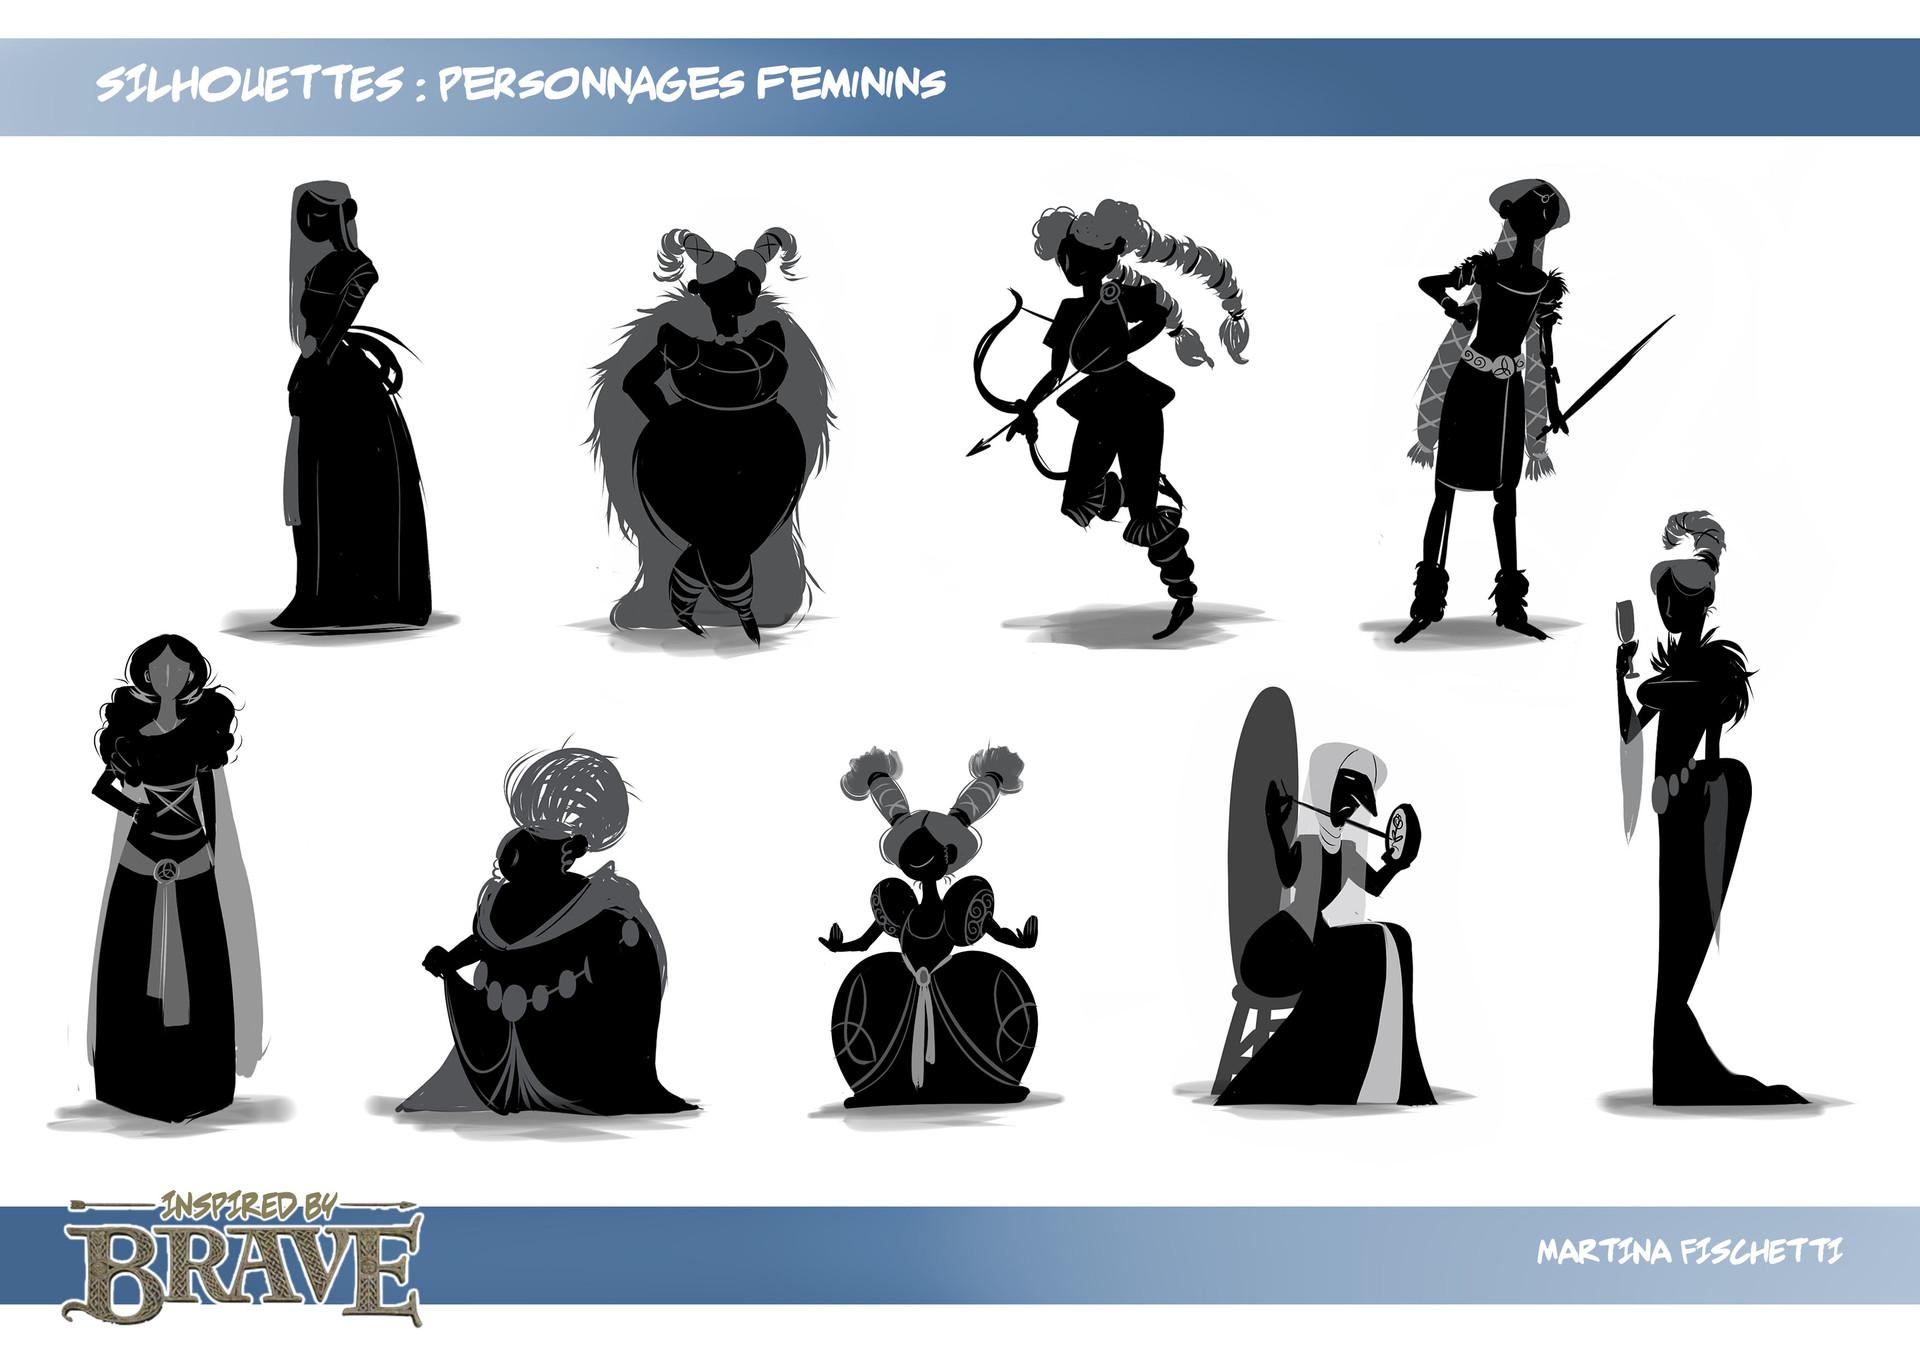 Martina fischetti 03 brave silhouettes femmes